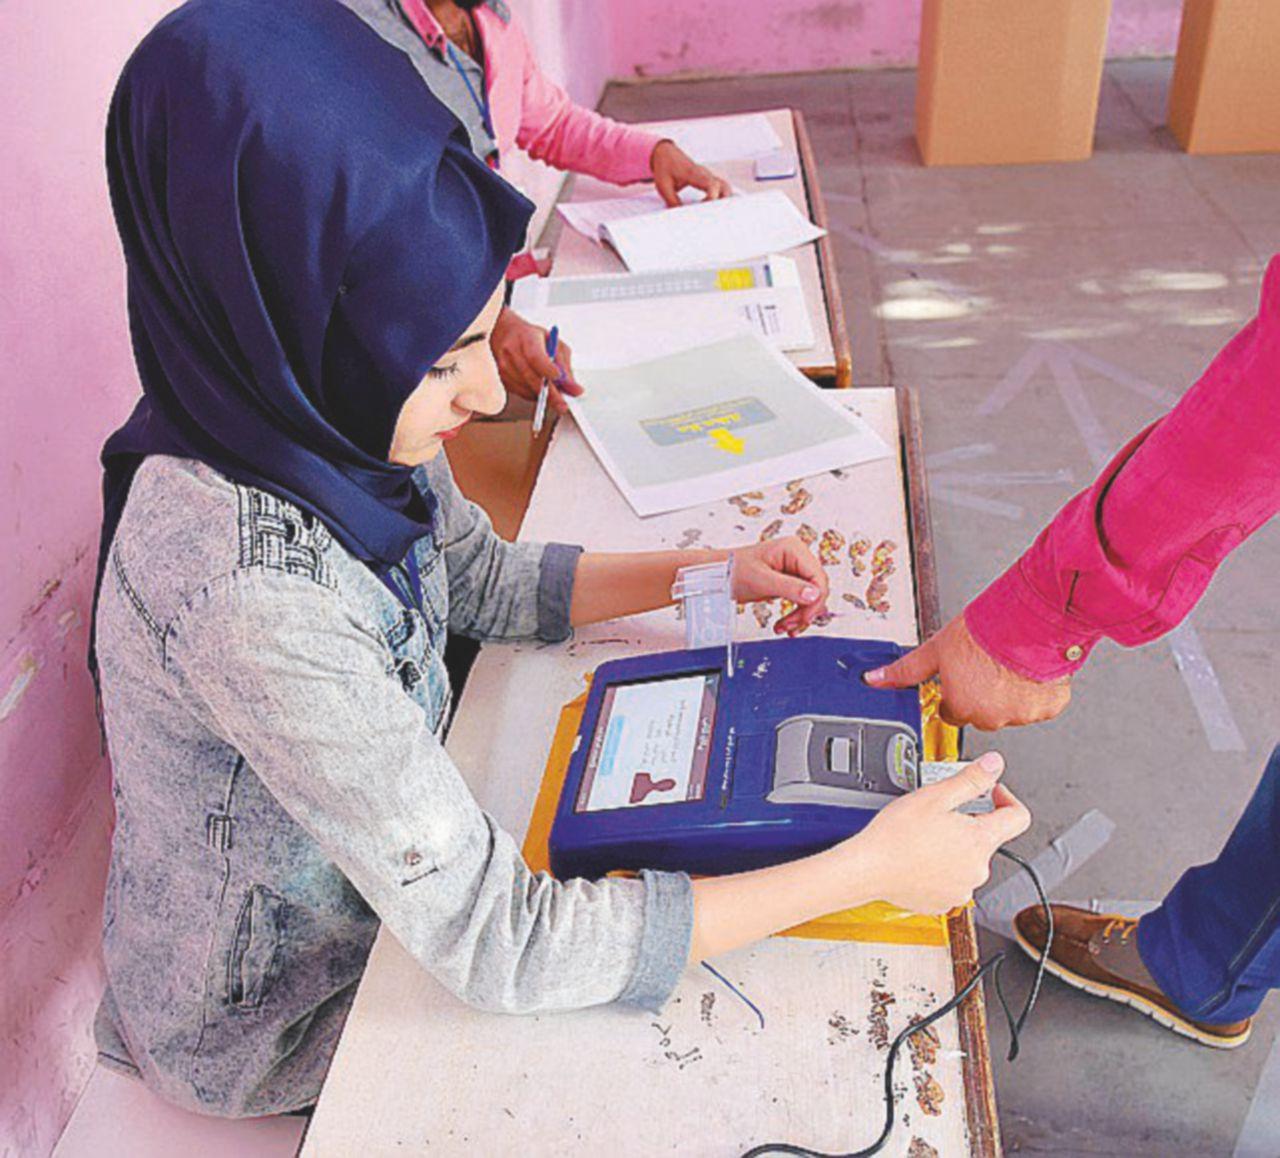 Iraq al voto, bassa affluenza e rigurgiti dell'Isis